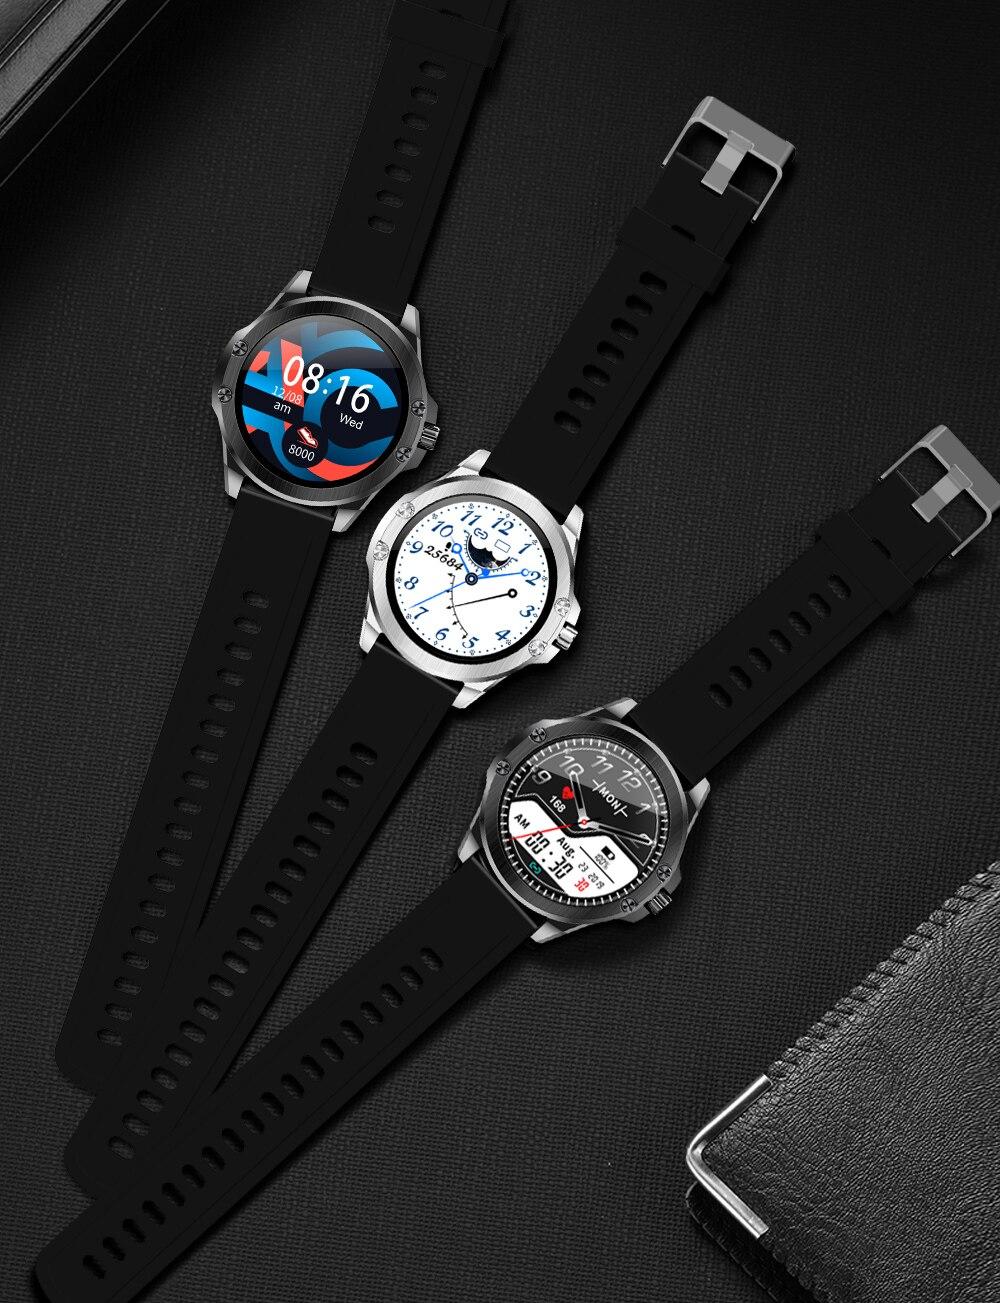 H8ef5474bd23c4bb2b6bc0062a8f209c2t CYUC S11 Smart watch men HD Full round Screen IP68 Waterproof